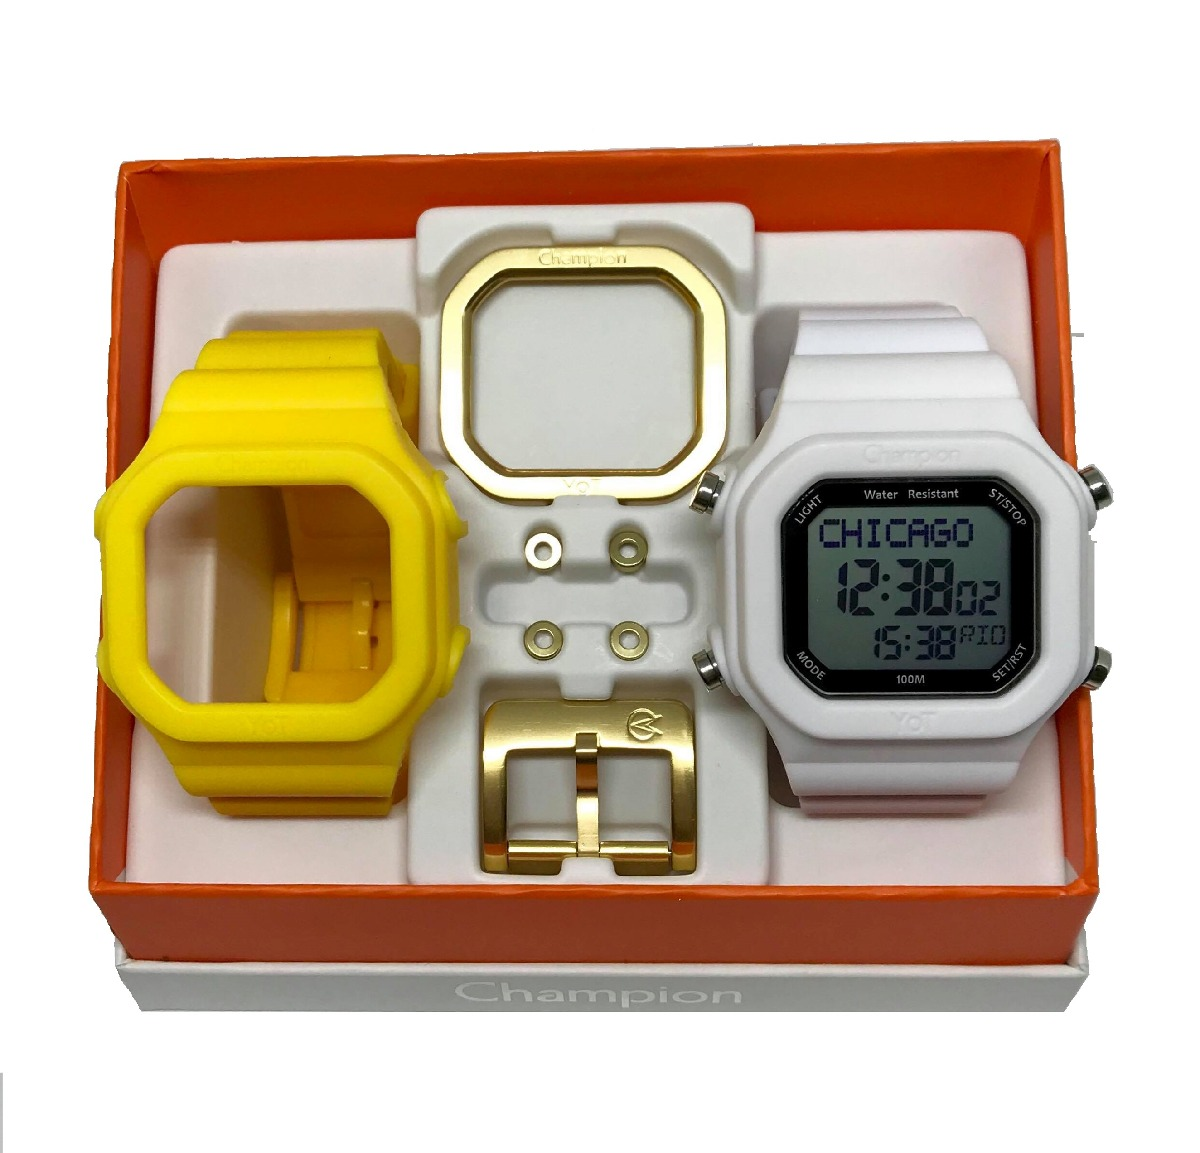 bfa193c9055 relogio champion yot digital quadrado troca pulseira. Carregando zoom.